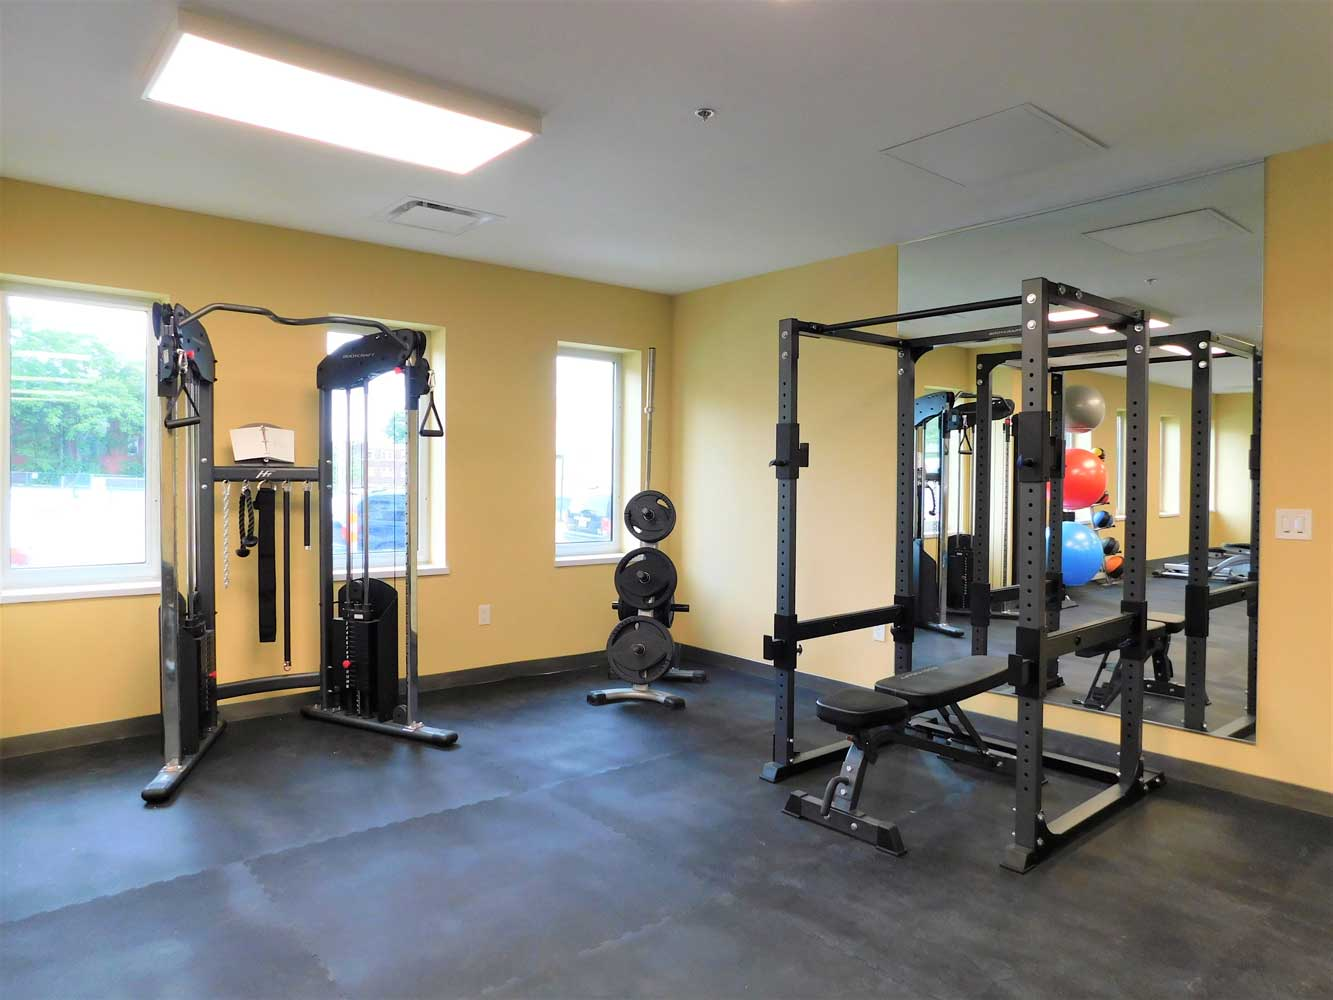 Gym Weights at Midtown Plaza Apartments in Kansas City, MO